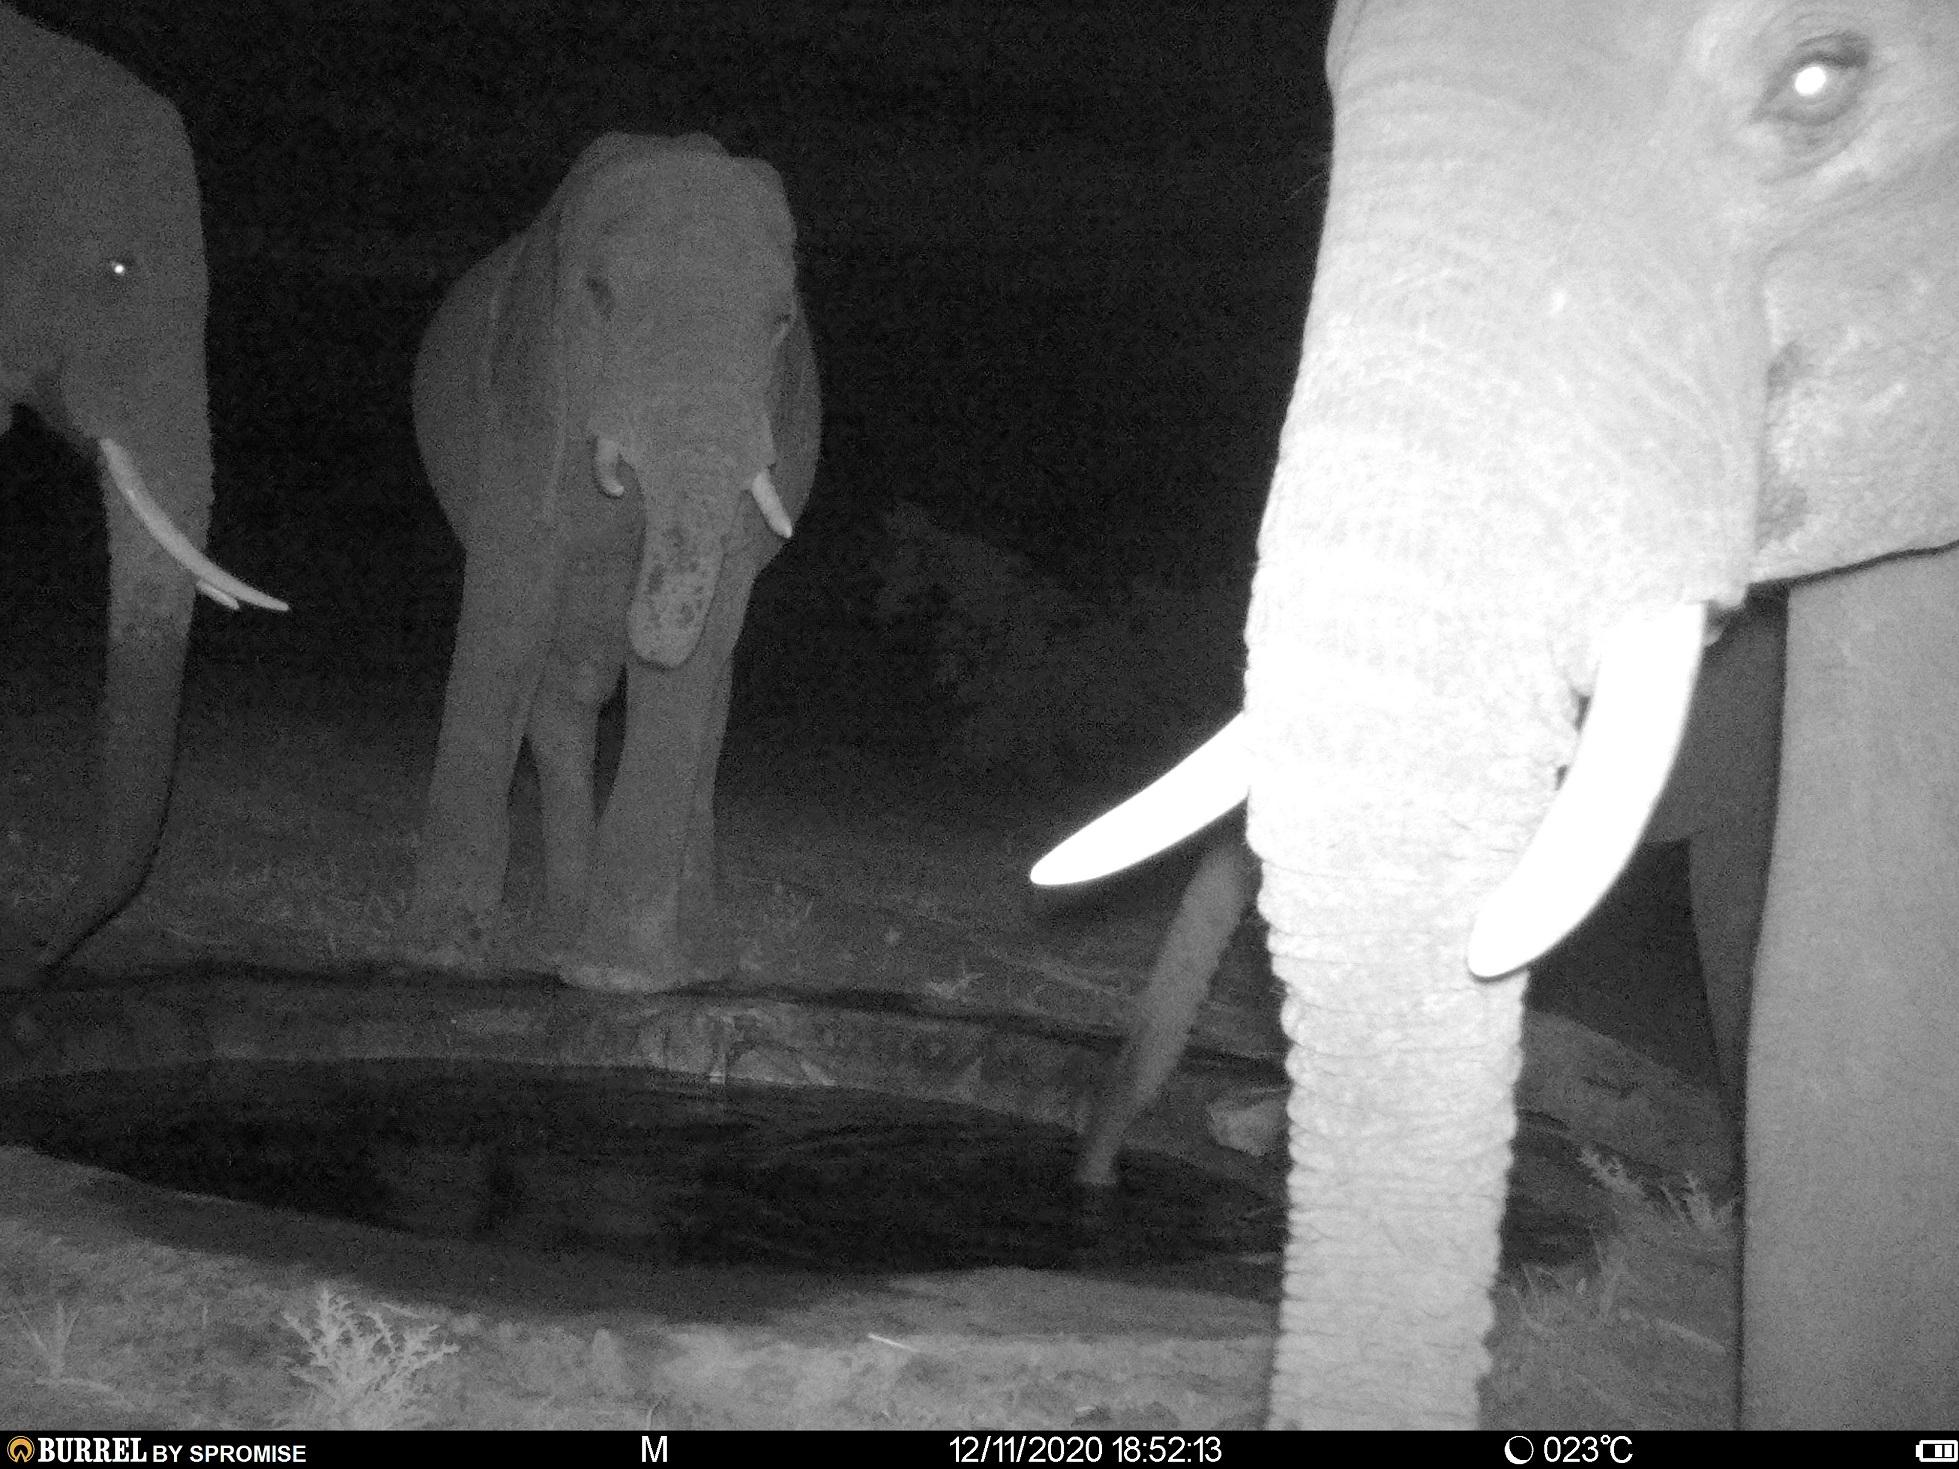 Elephants enjoying a night time drink